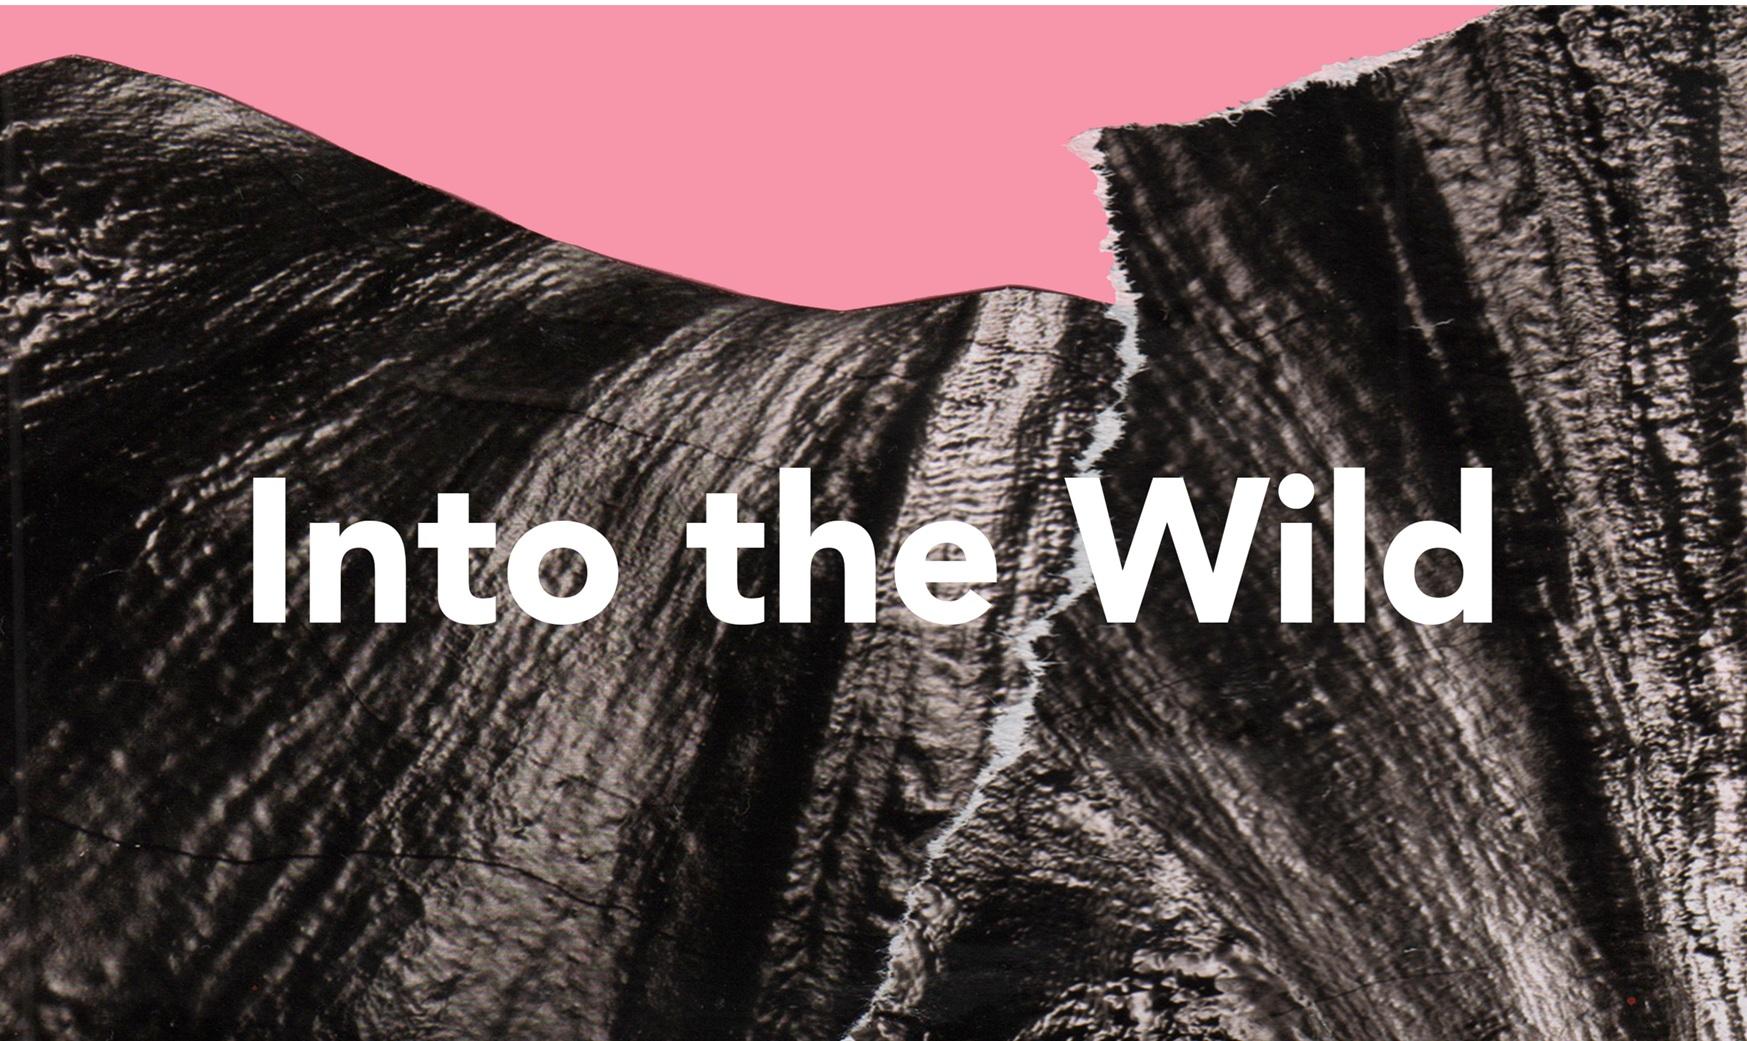 into+the+wild.jpg